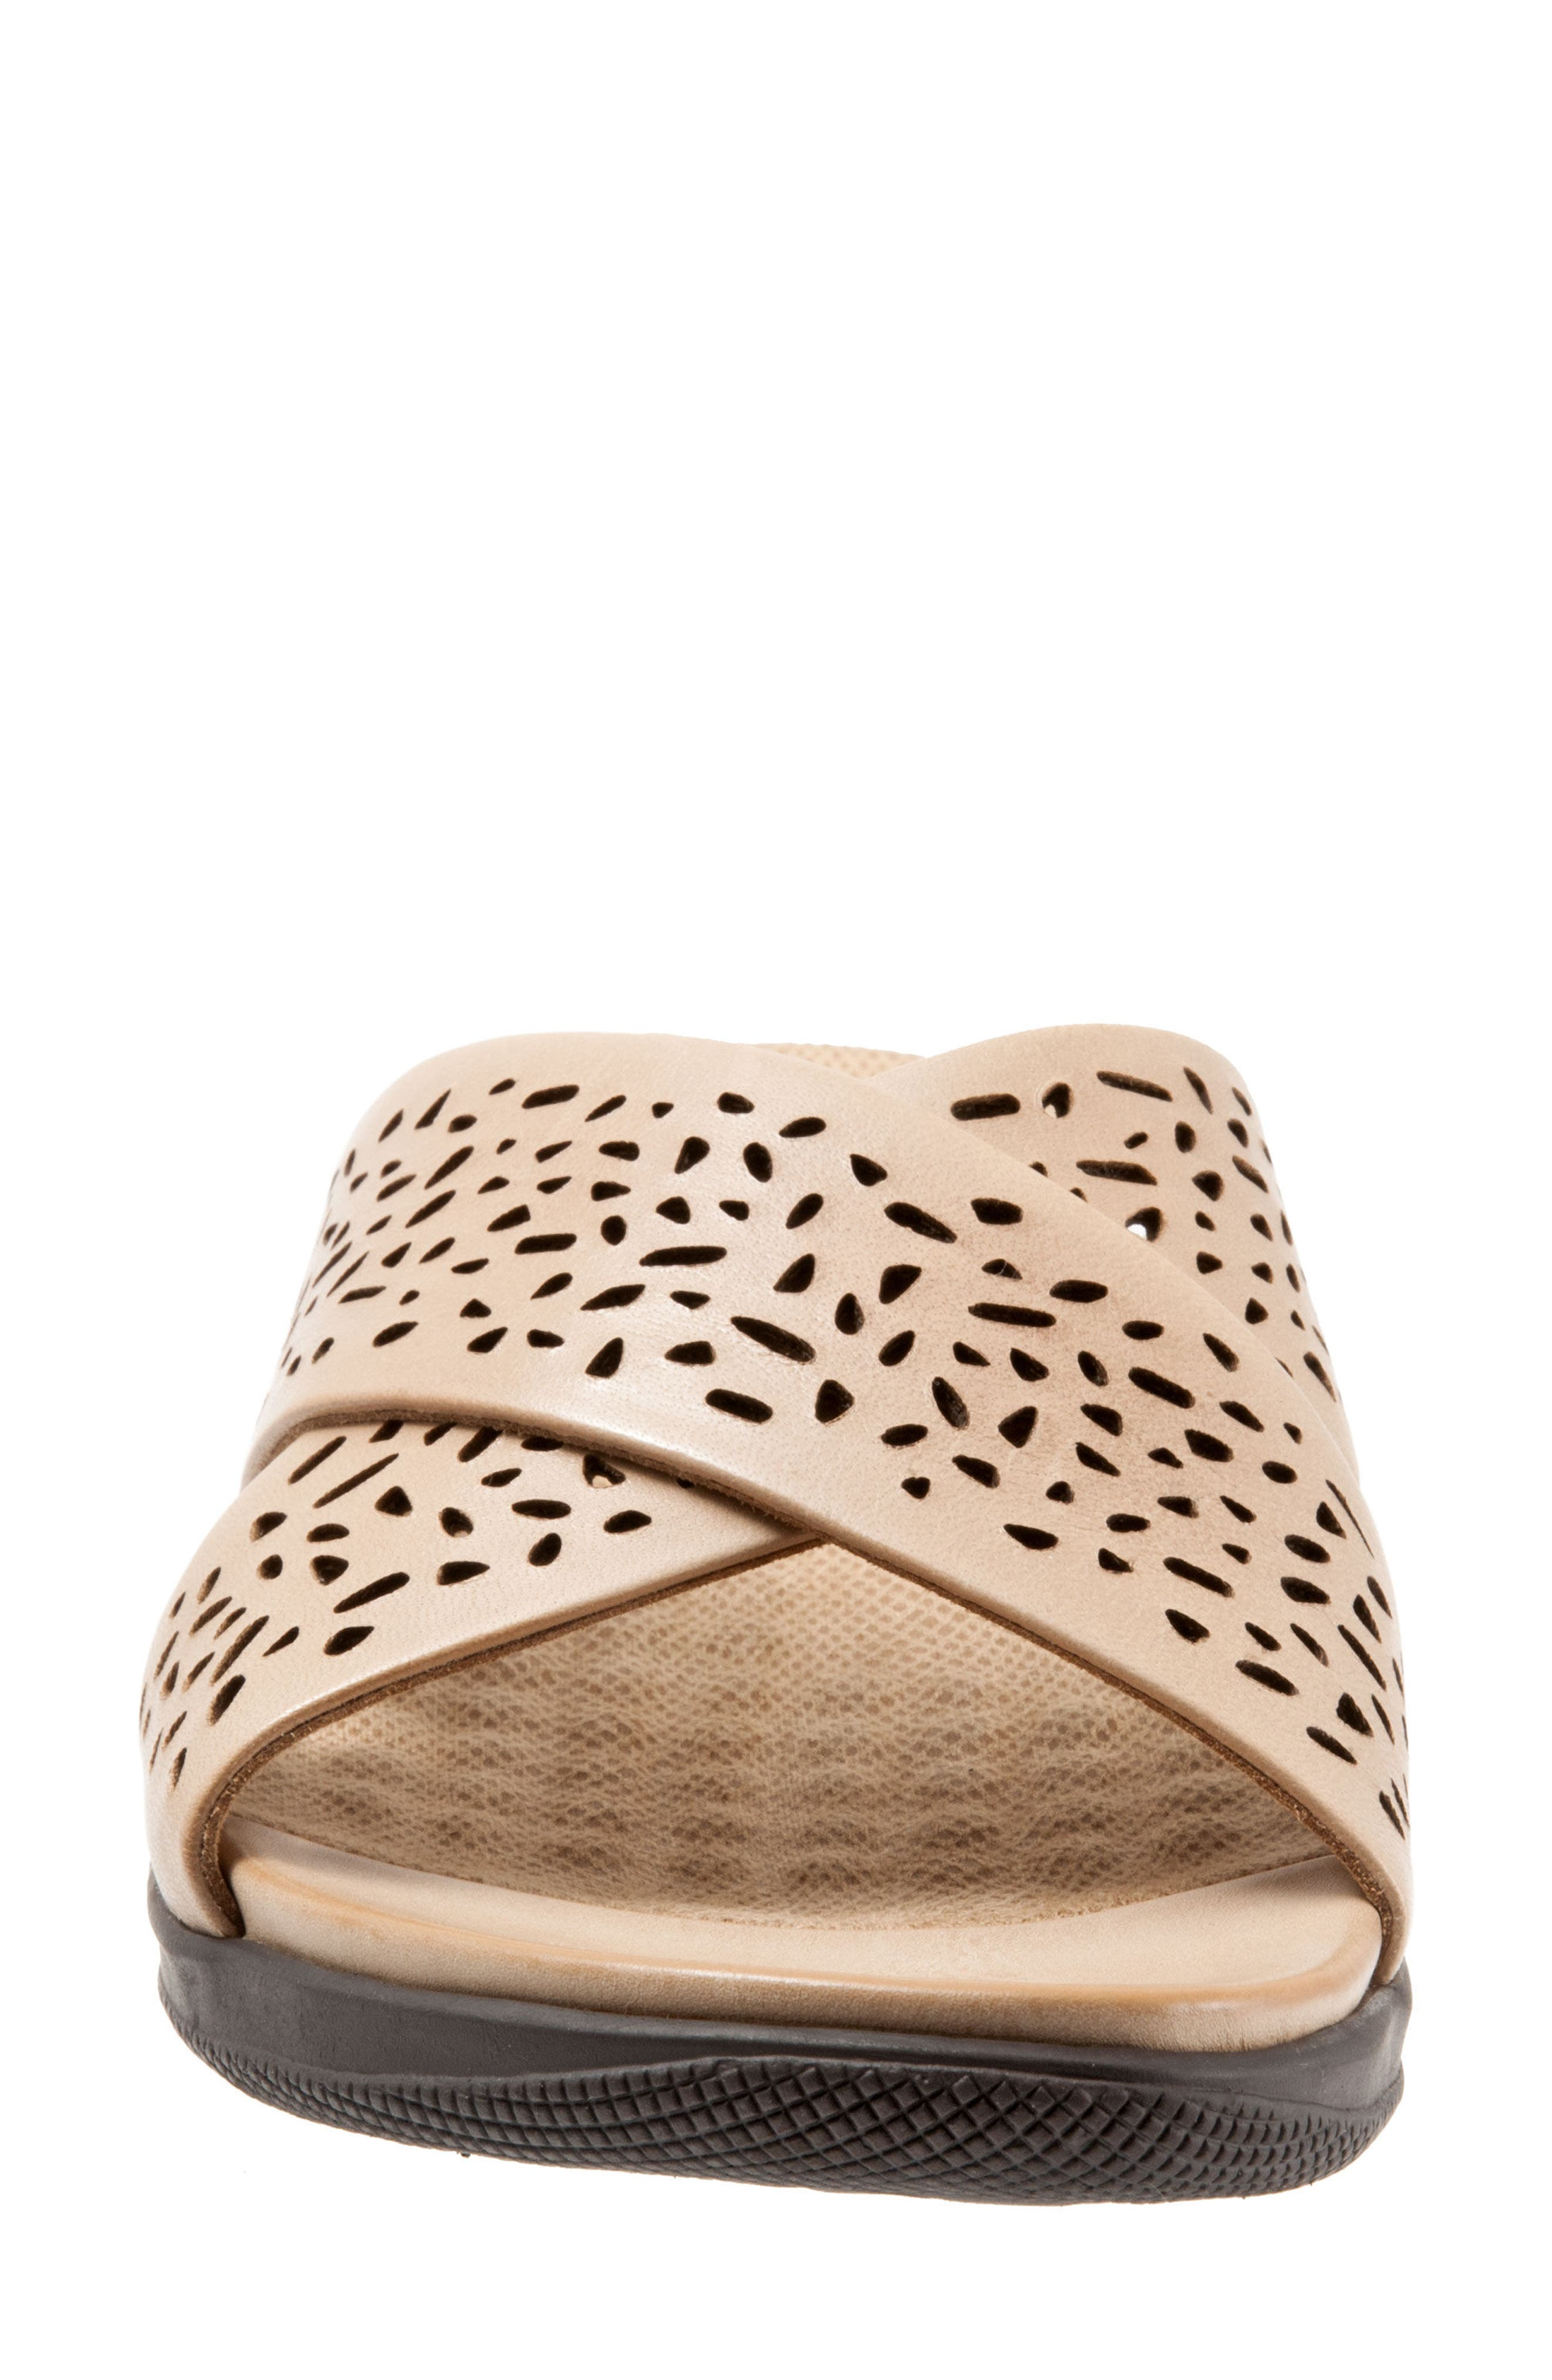 'Tillman' Leather Cross Strap Slide Sandal,                             Alternate thumbnail 4, color,                             Cement Leather